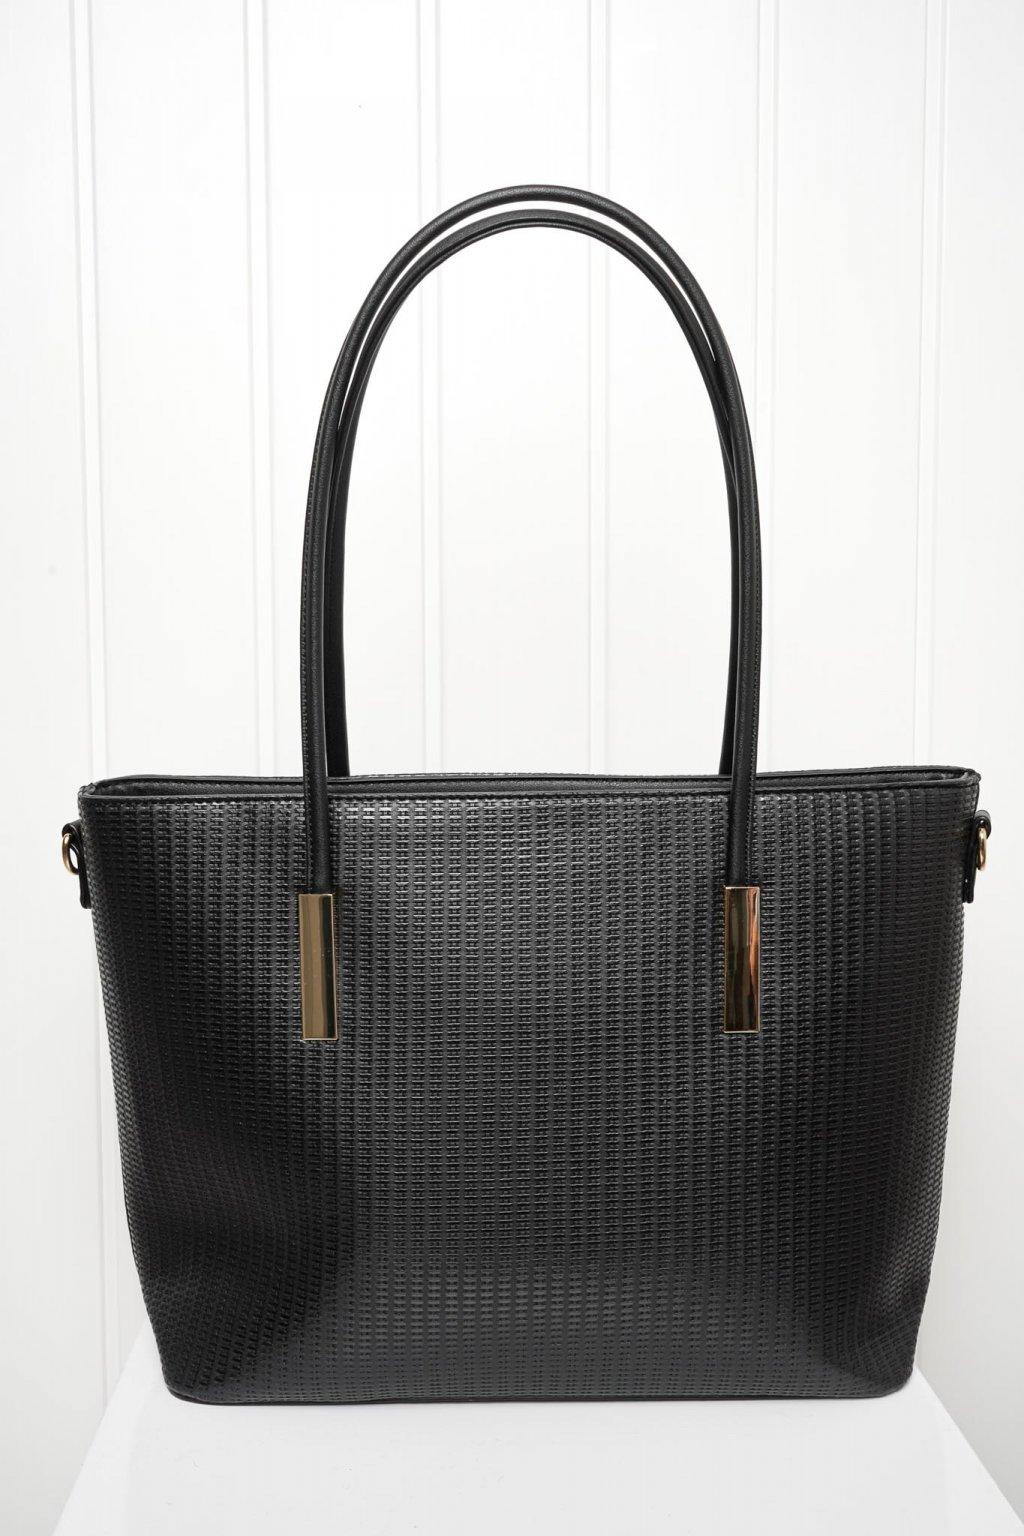 Kabelka, crossbody, ruksak, shopping bag, shopperka, 027